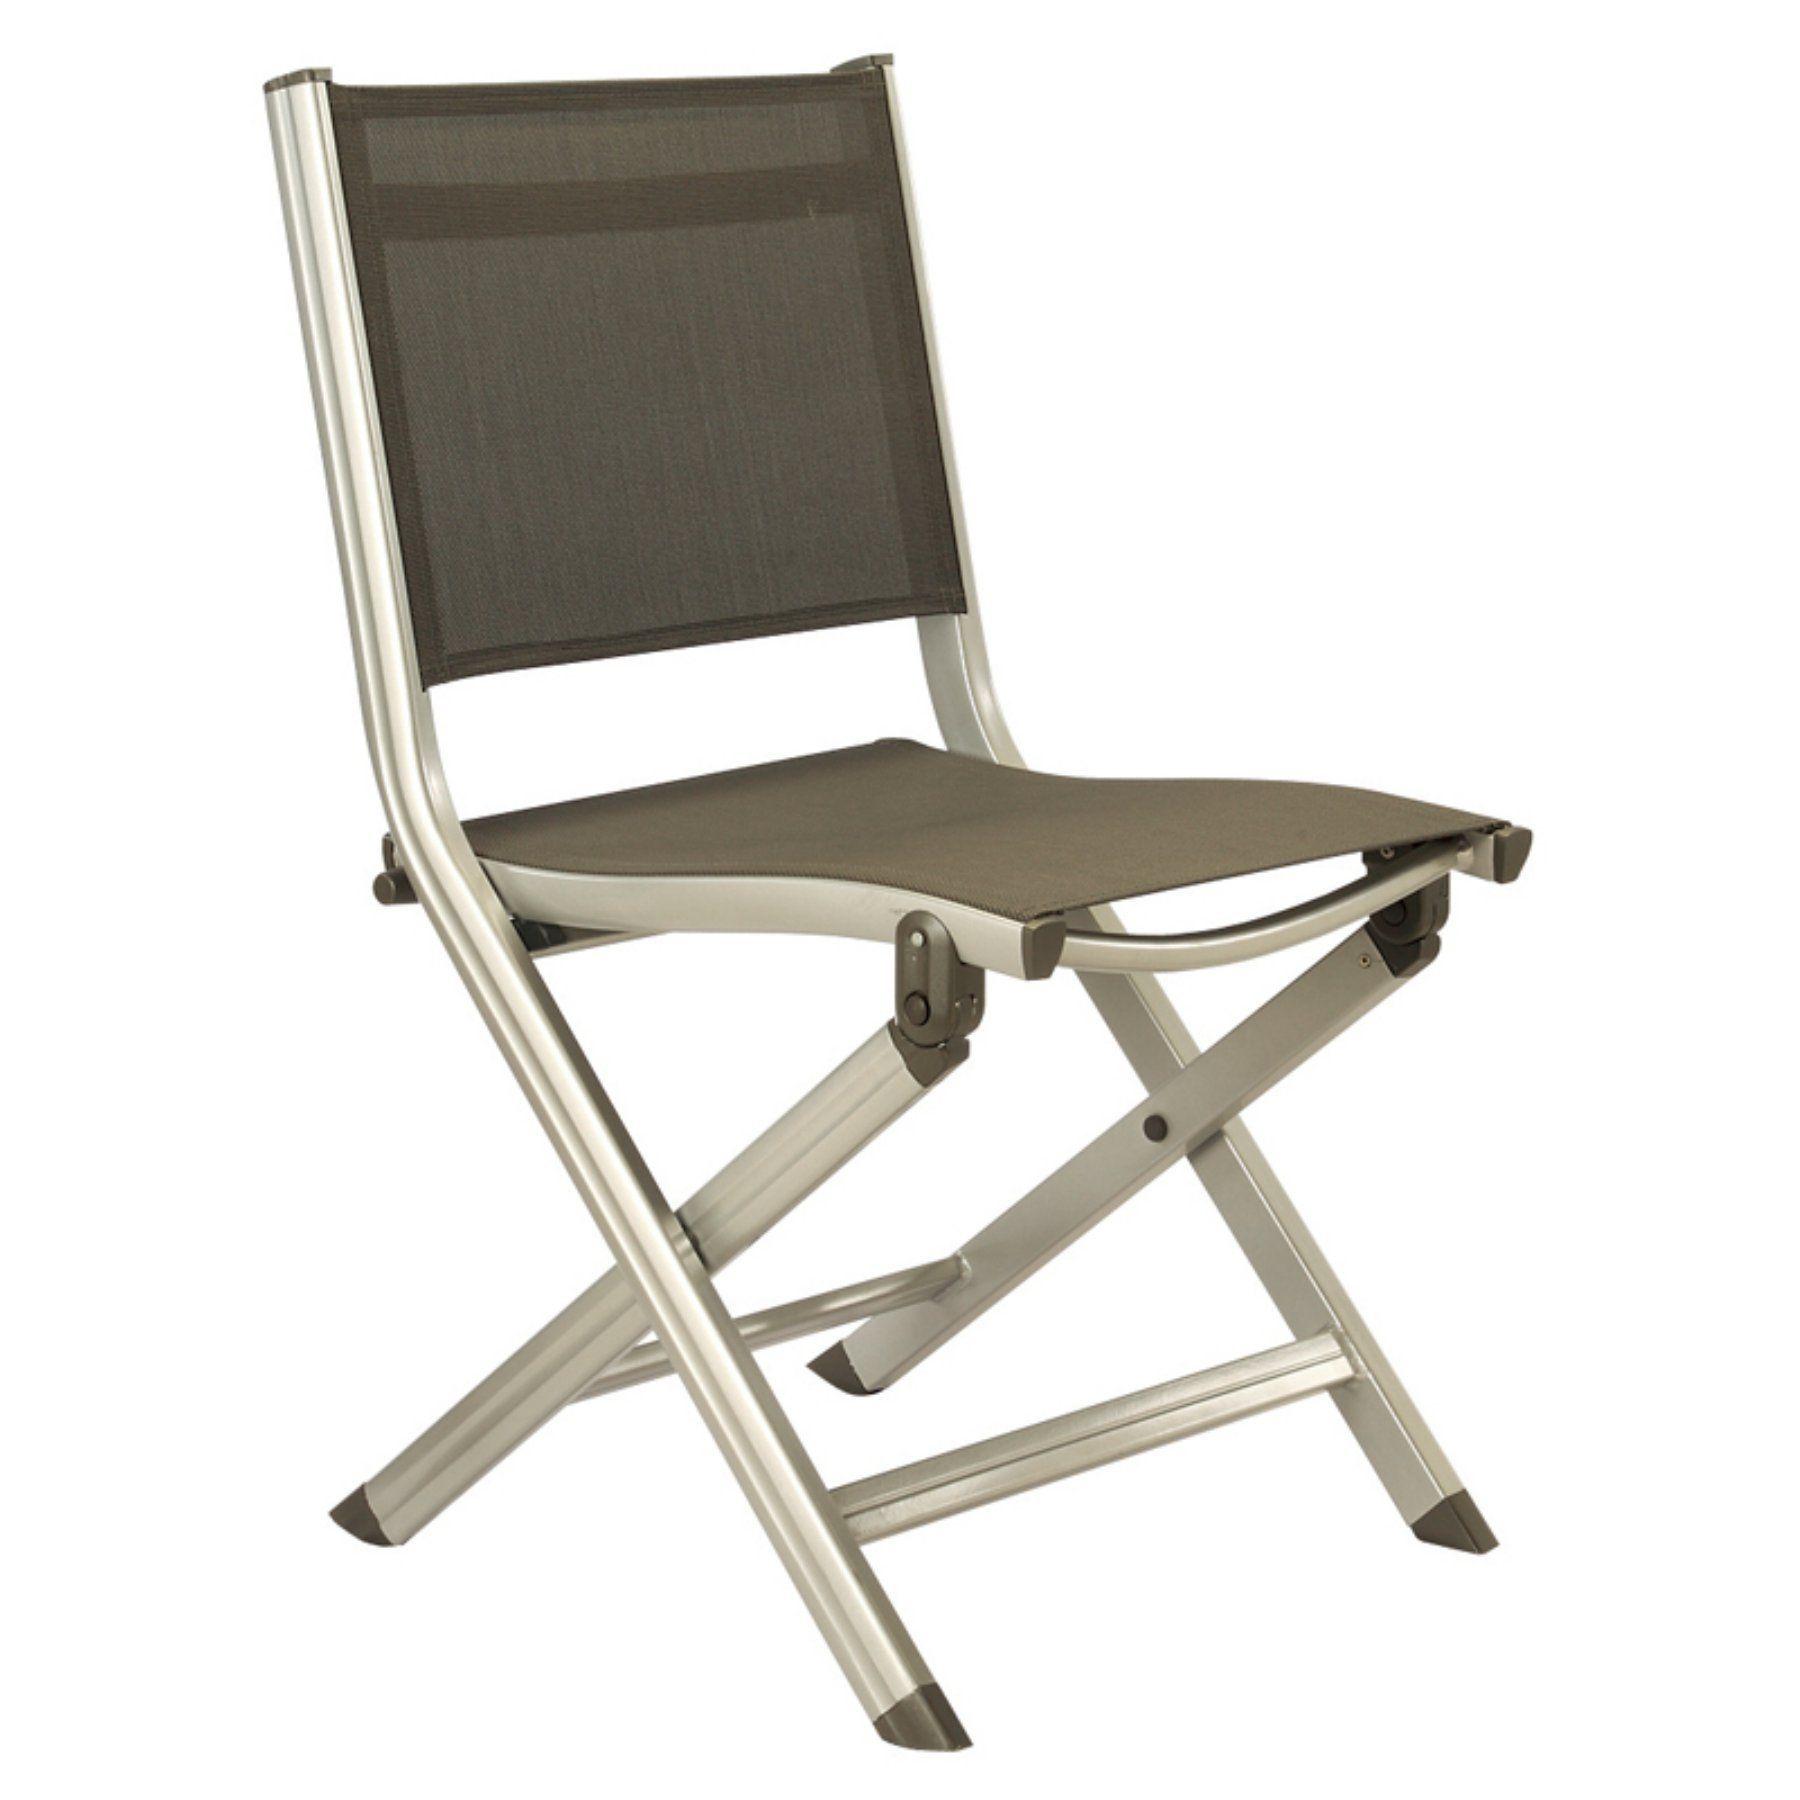 Outdoor Kettler Basic Plus Folding Side Chair - 301218-0000 | Side ...